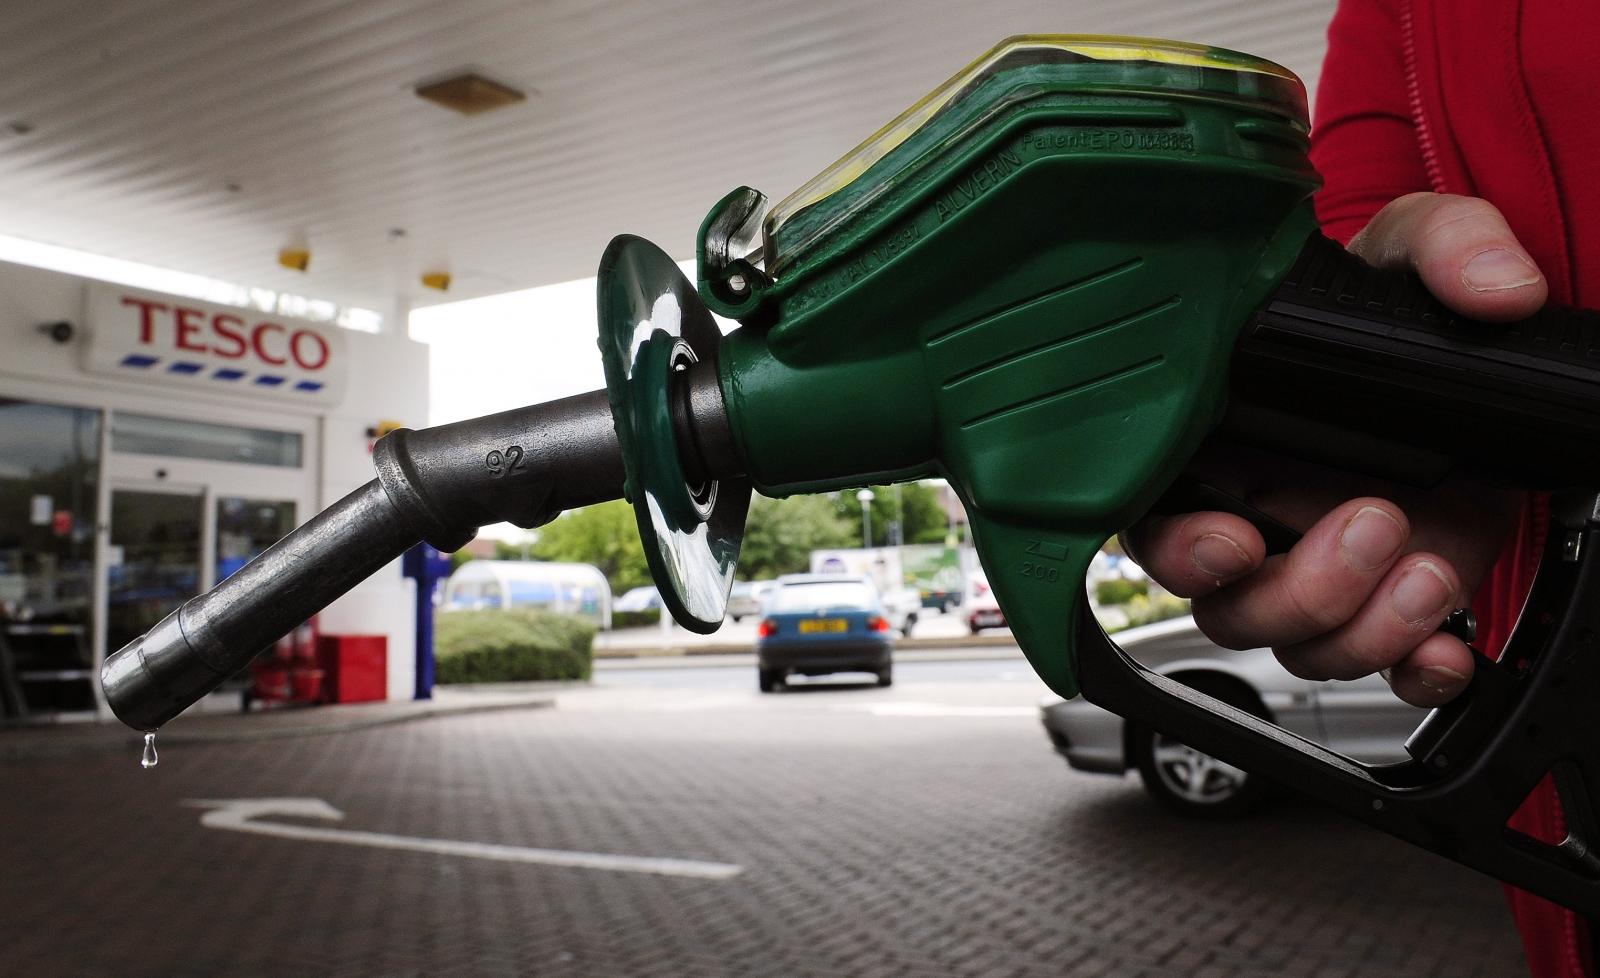 Tesco, Sainsbury's and Asda Cut Fuel Prices